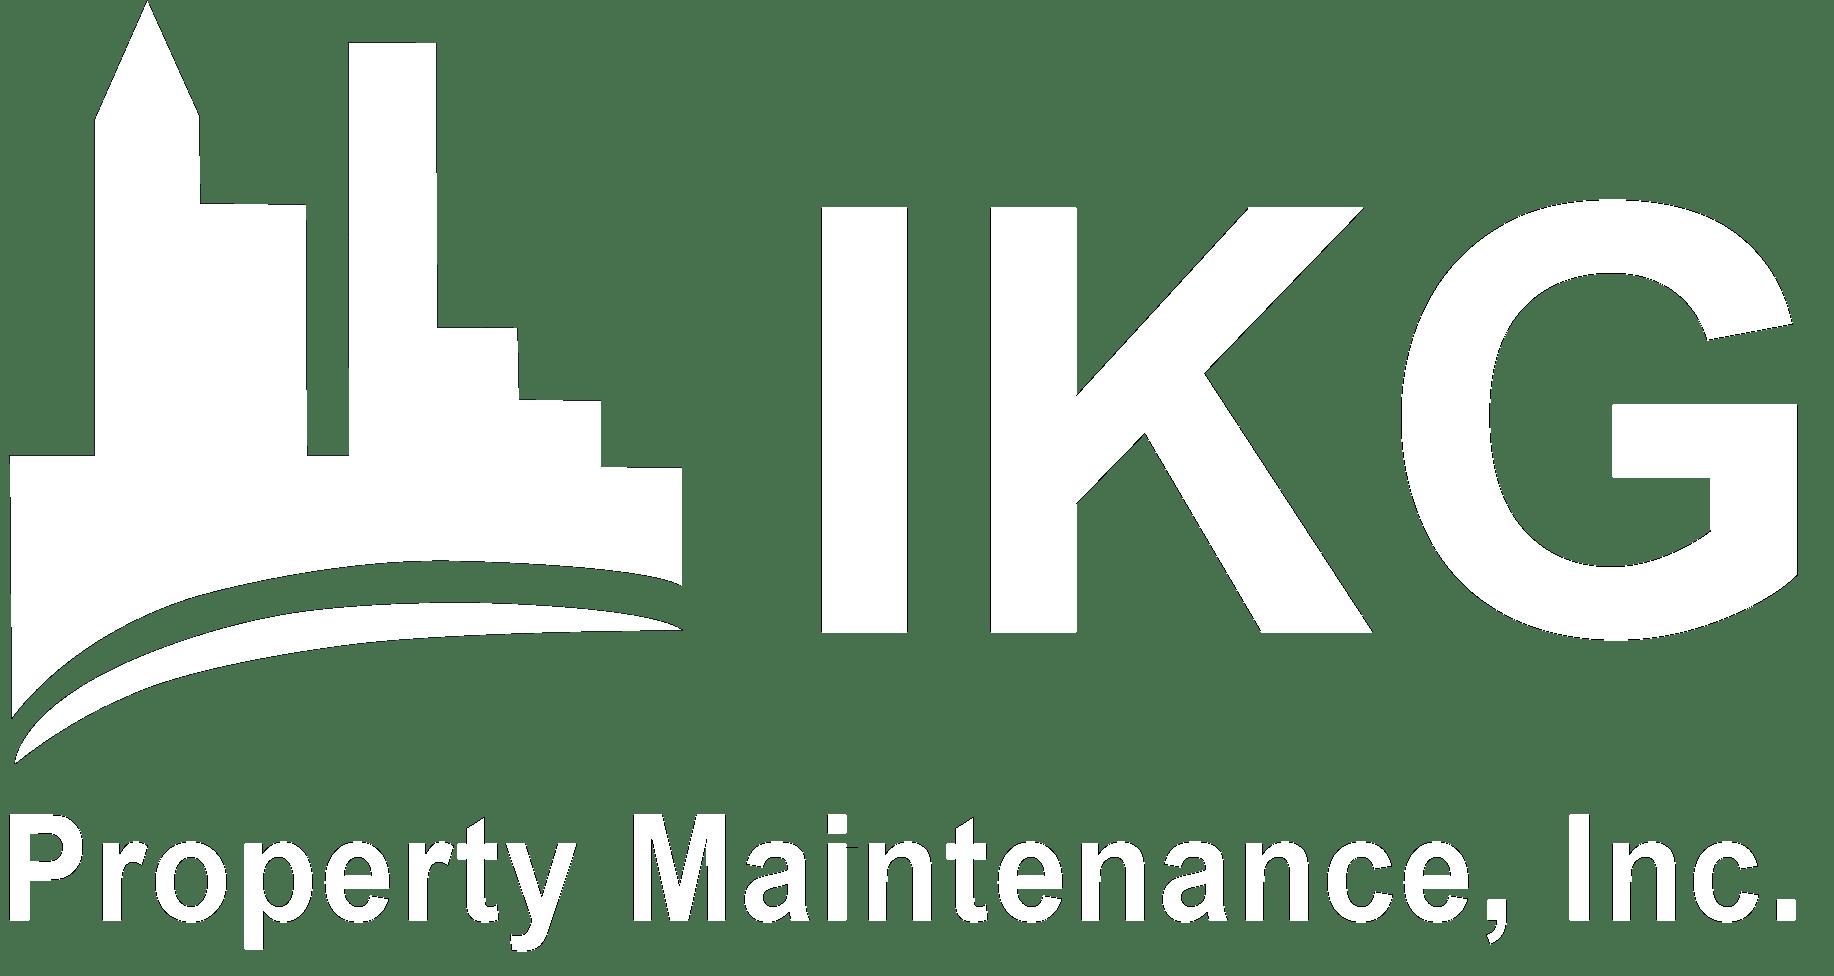 IKG PROPERTY MAINTENANCE, INC.